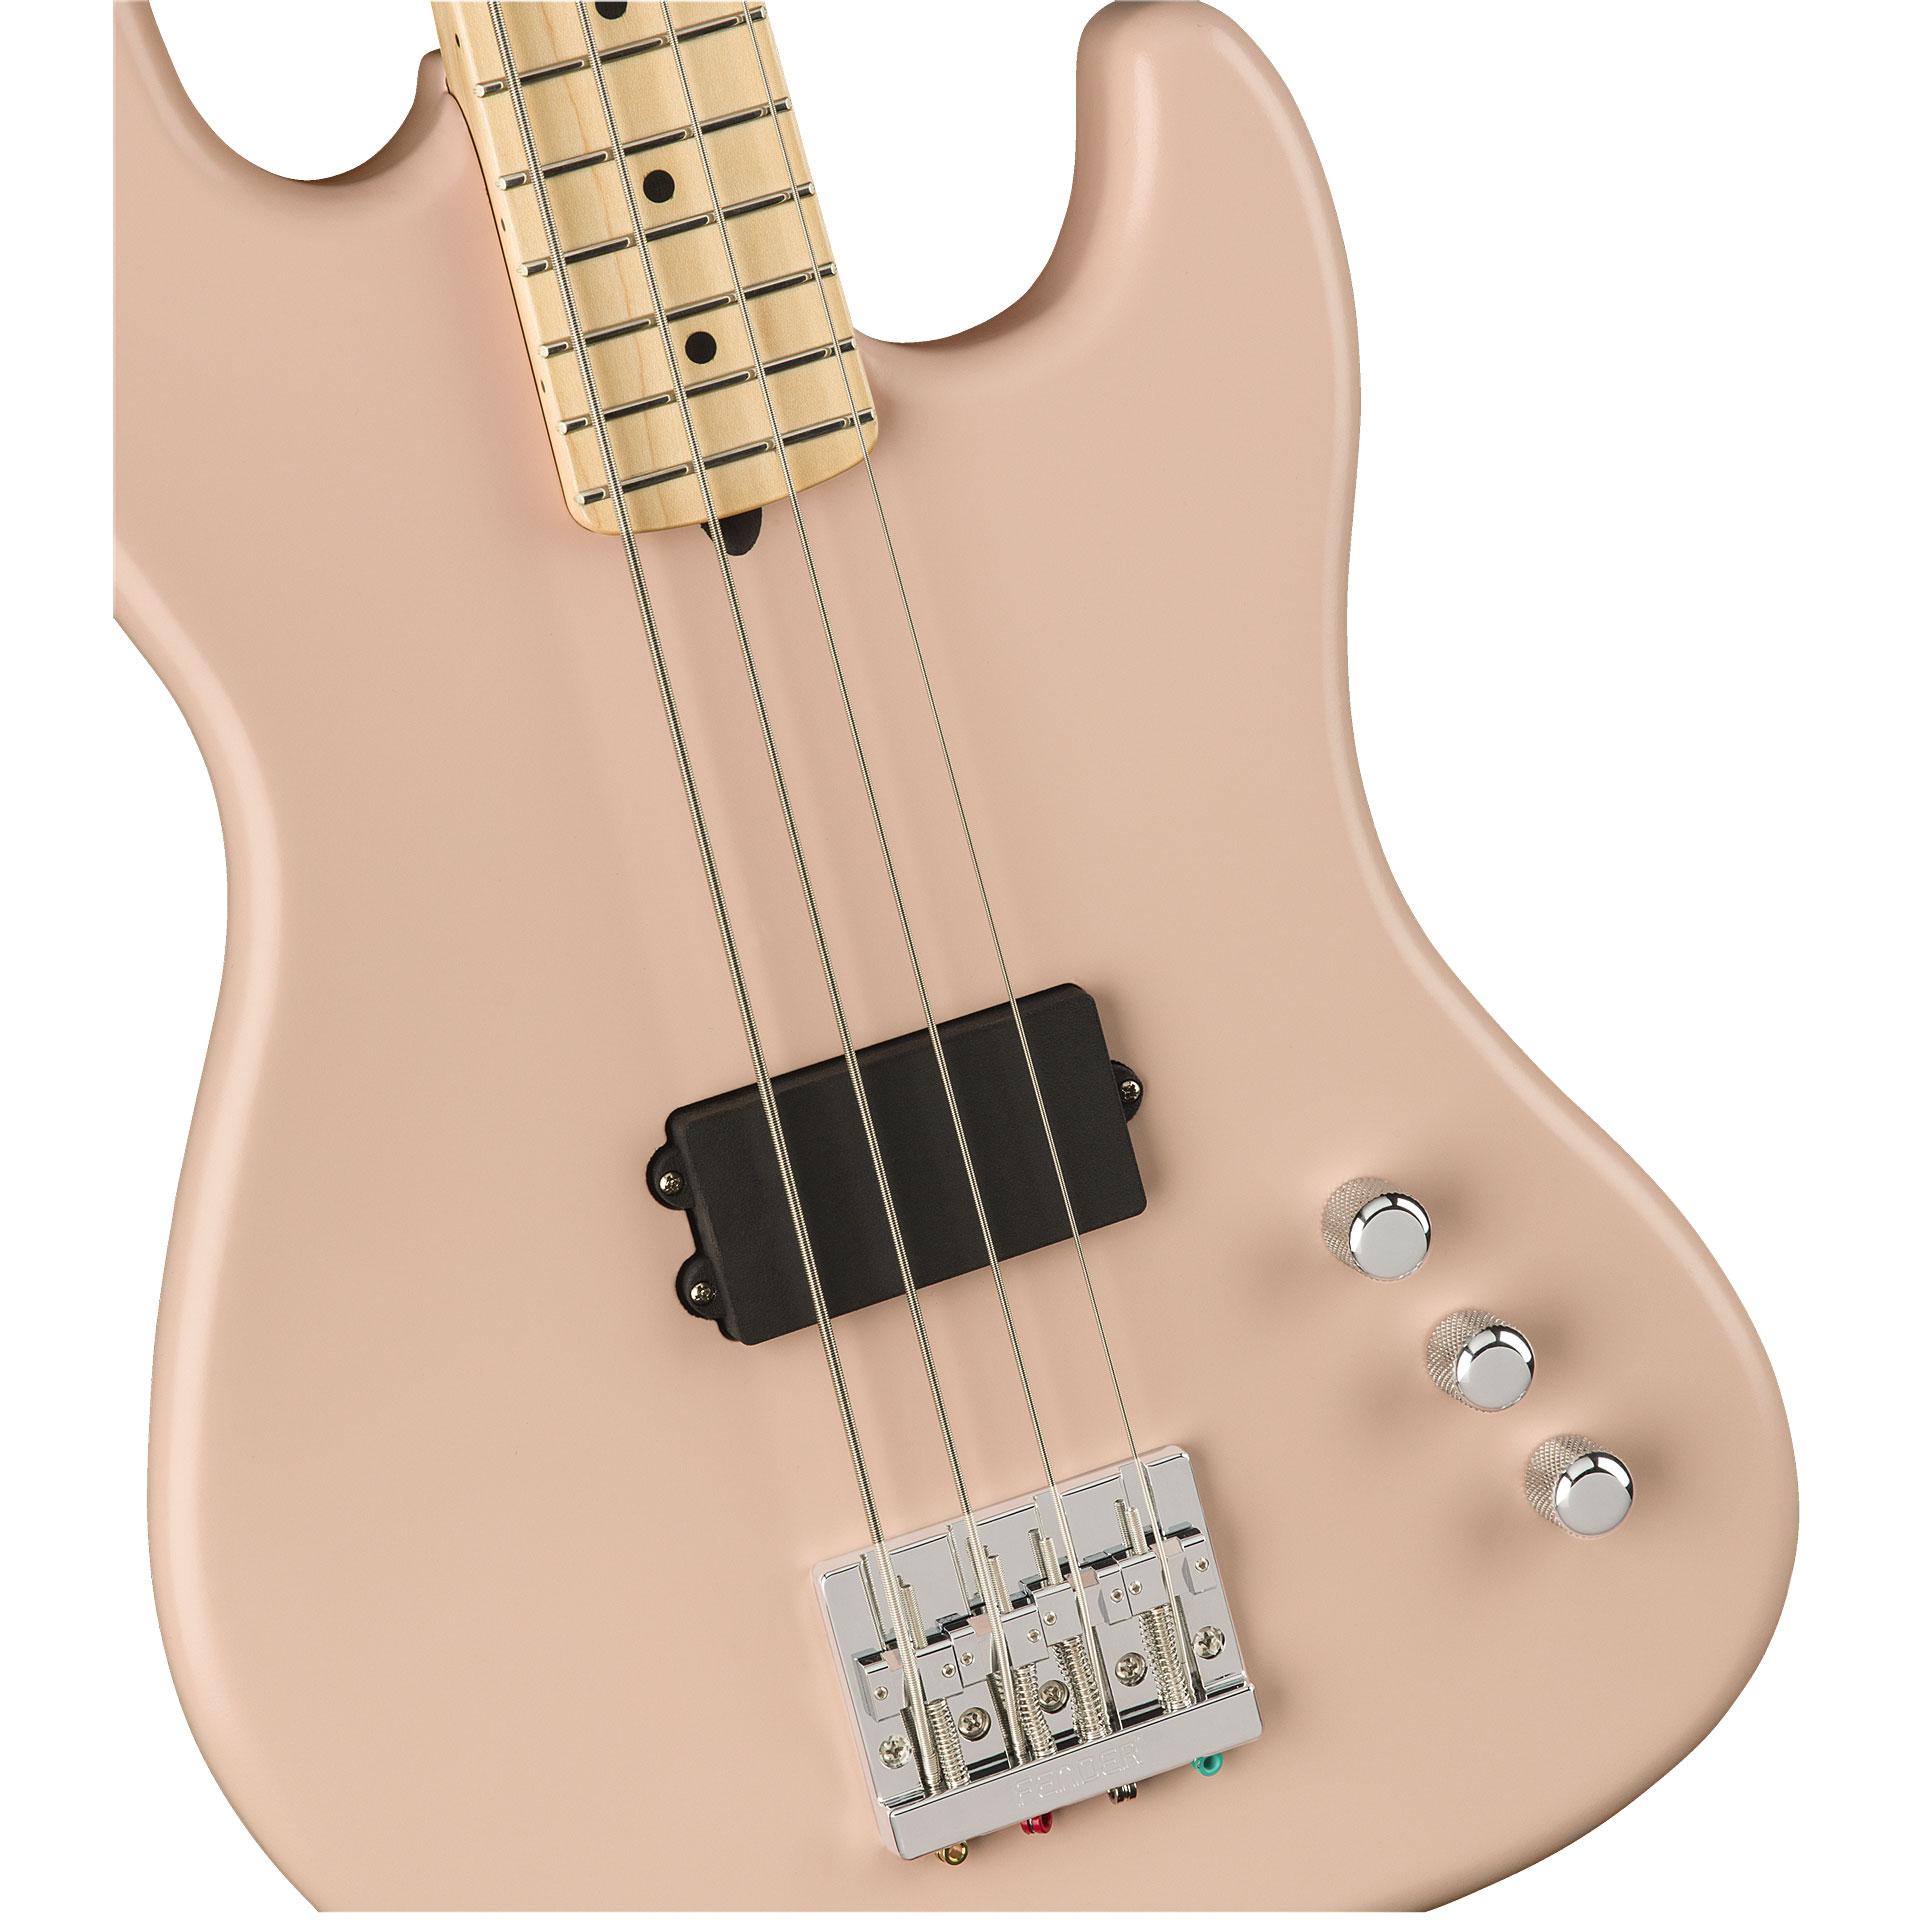 fender flea signature usa jazz bass active shp 10108945 electric bass guitar. Black Bedroom Furniture Sets. Home Design Ideas